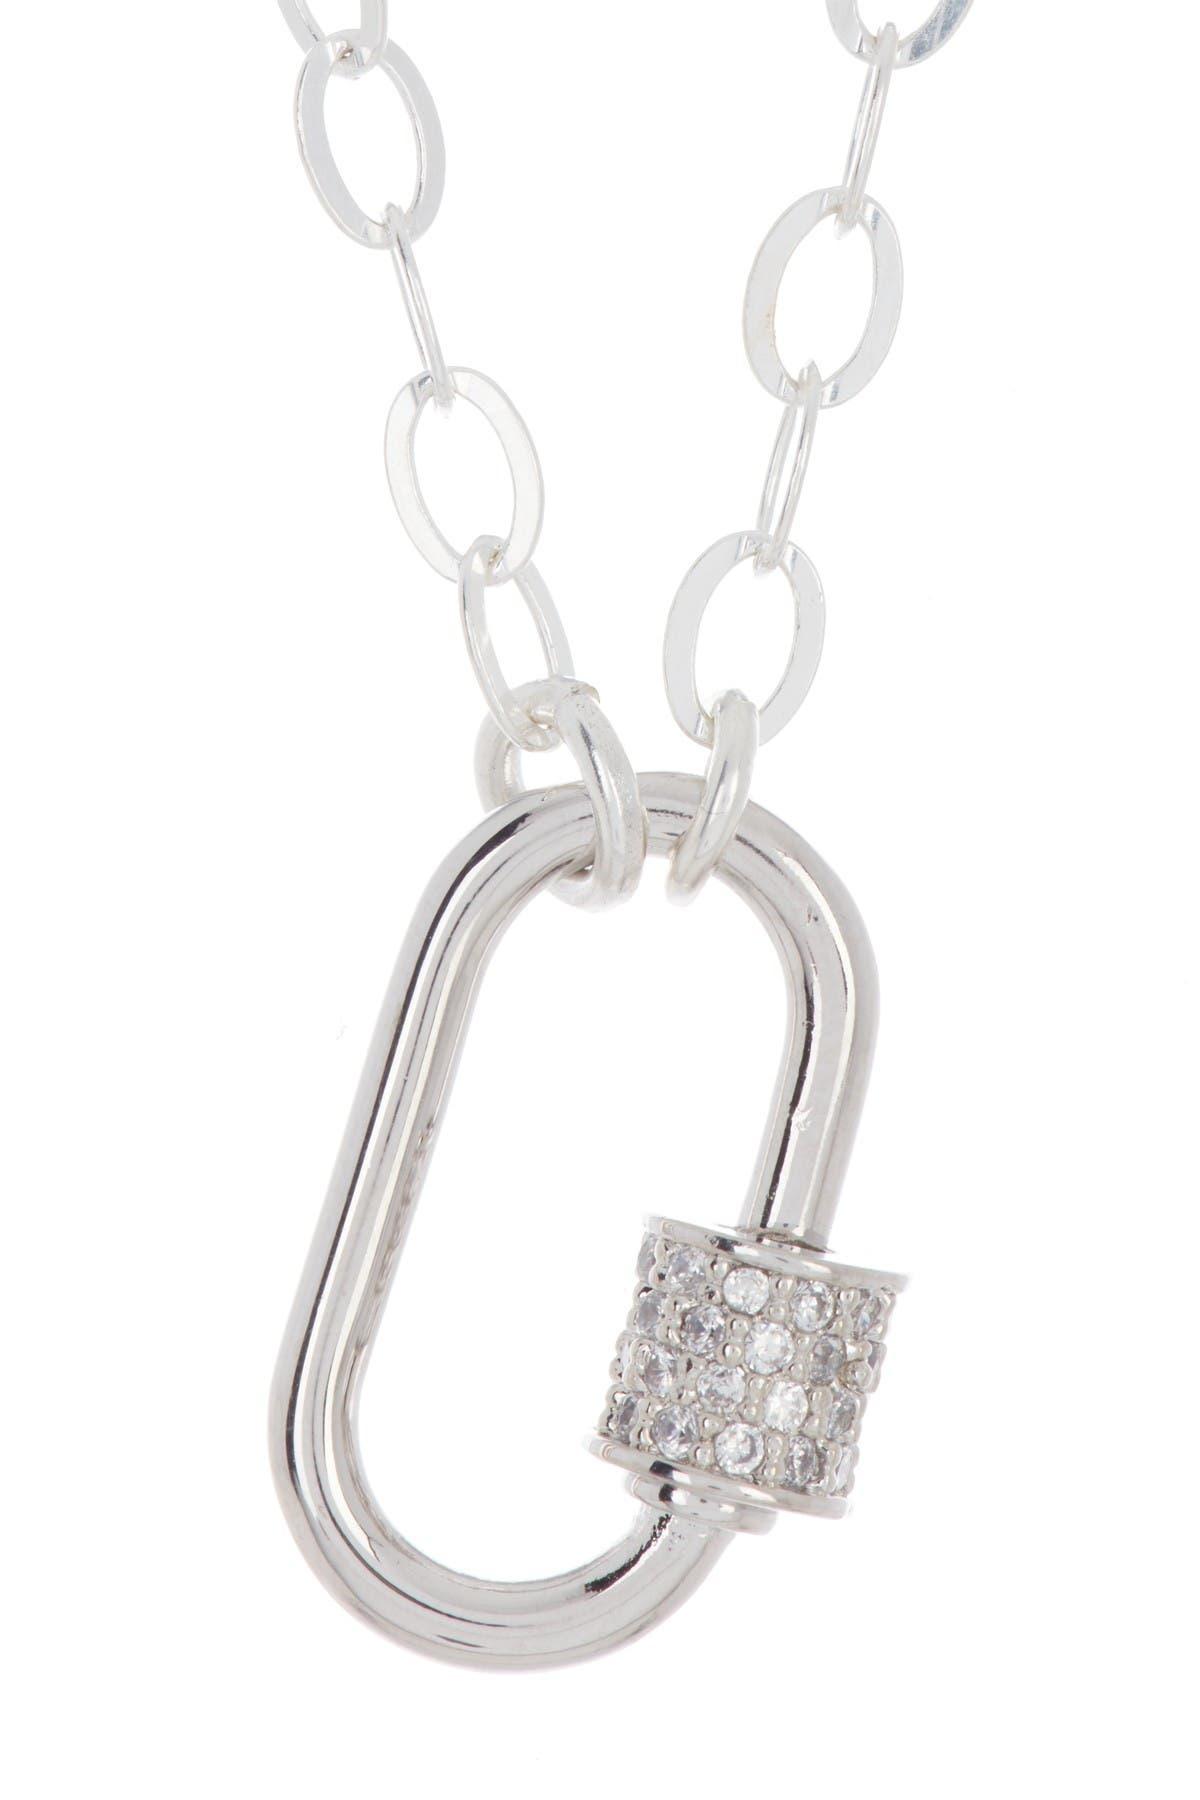 Image of ADORNIA Oval Screw Lock Pendant Necklace